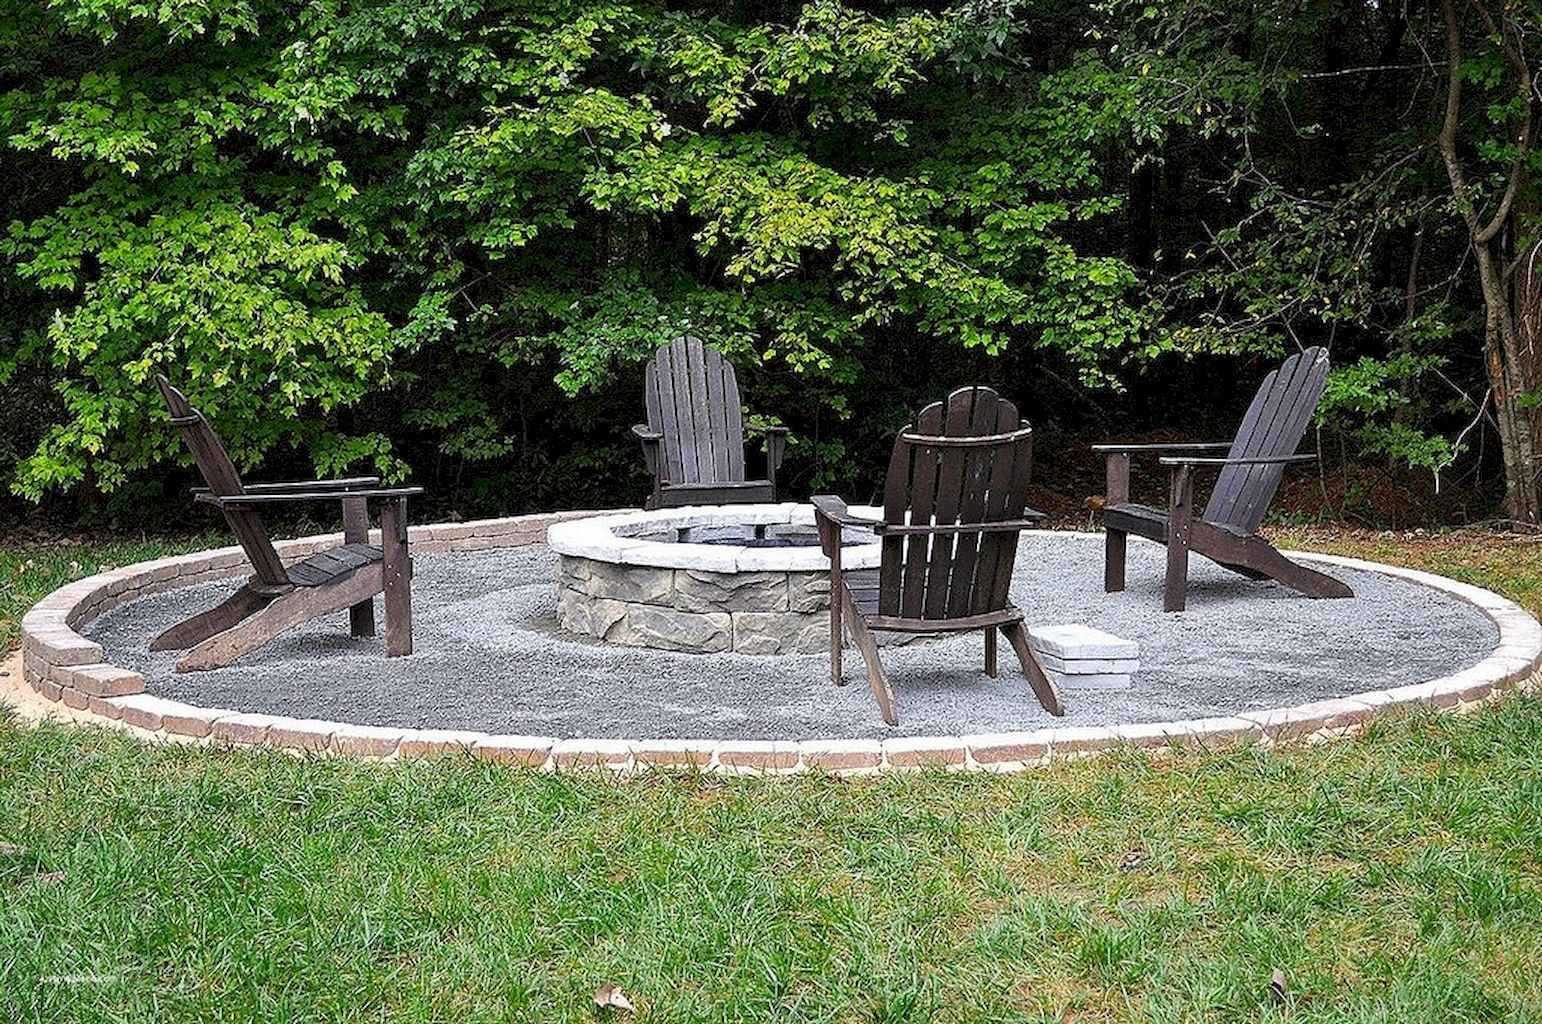 60 Beautiful Backyard Fire Pit Ideas Decoration and Remodel (22)